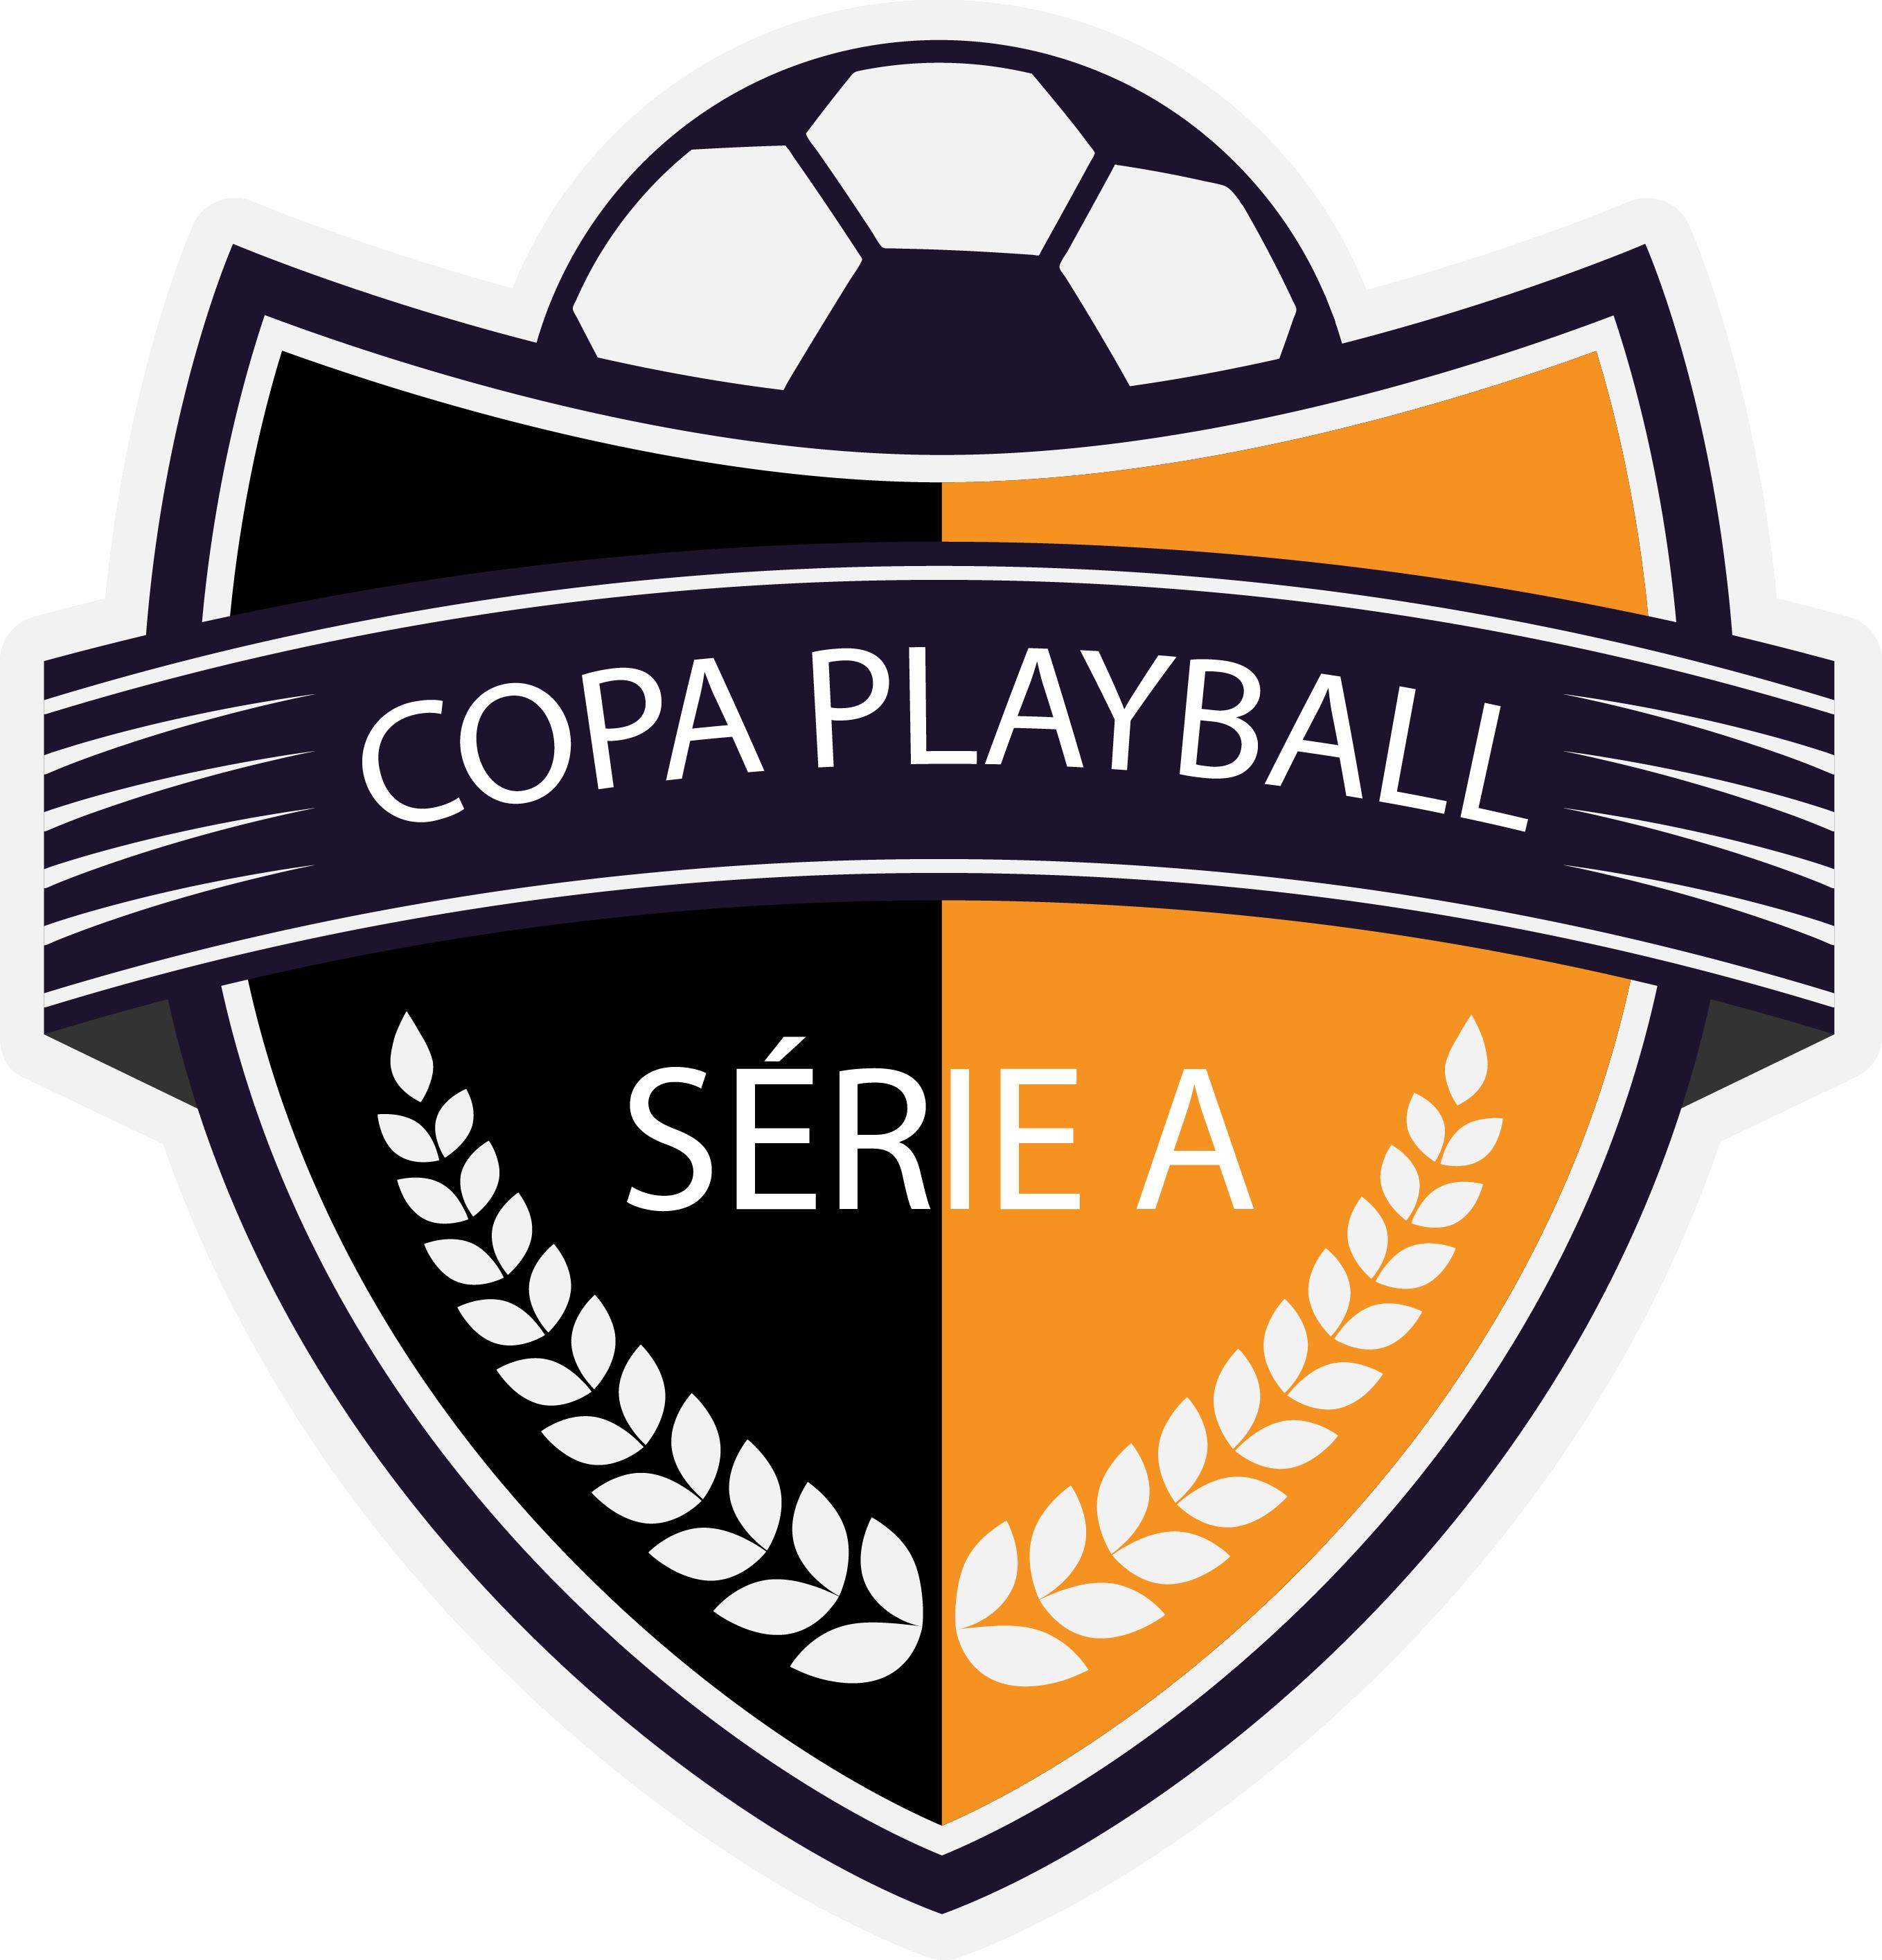 XII Copa Playball: Série A